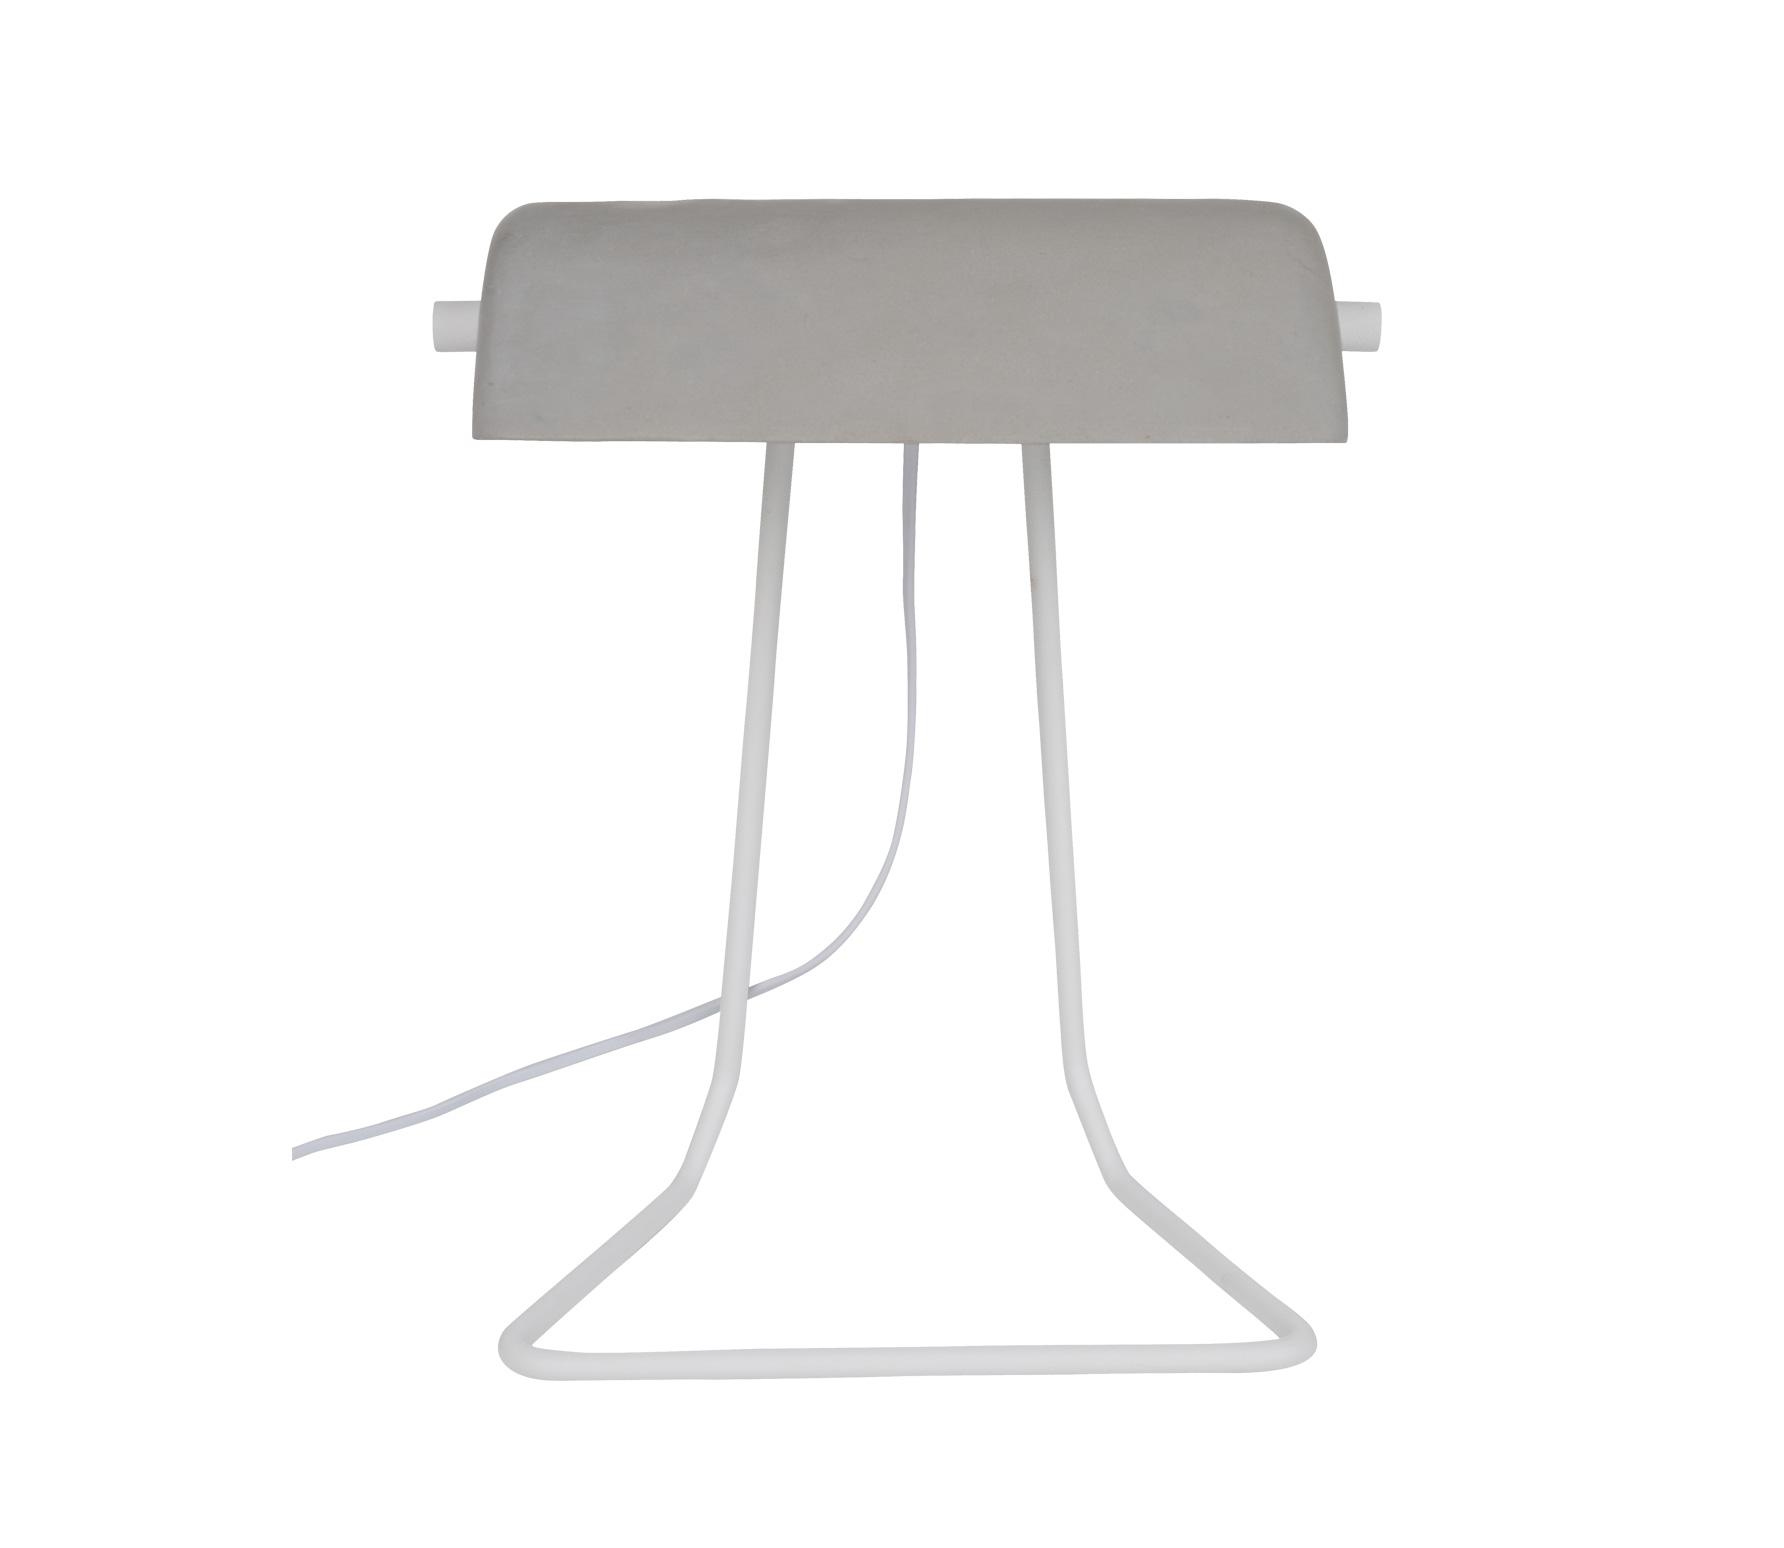 Zuiver Broker bureau/tafellamp concrete